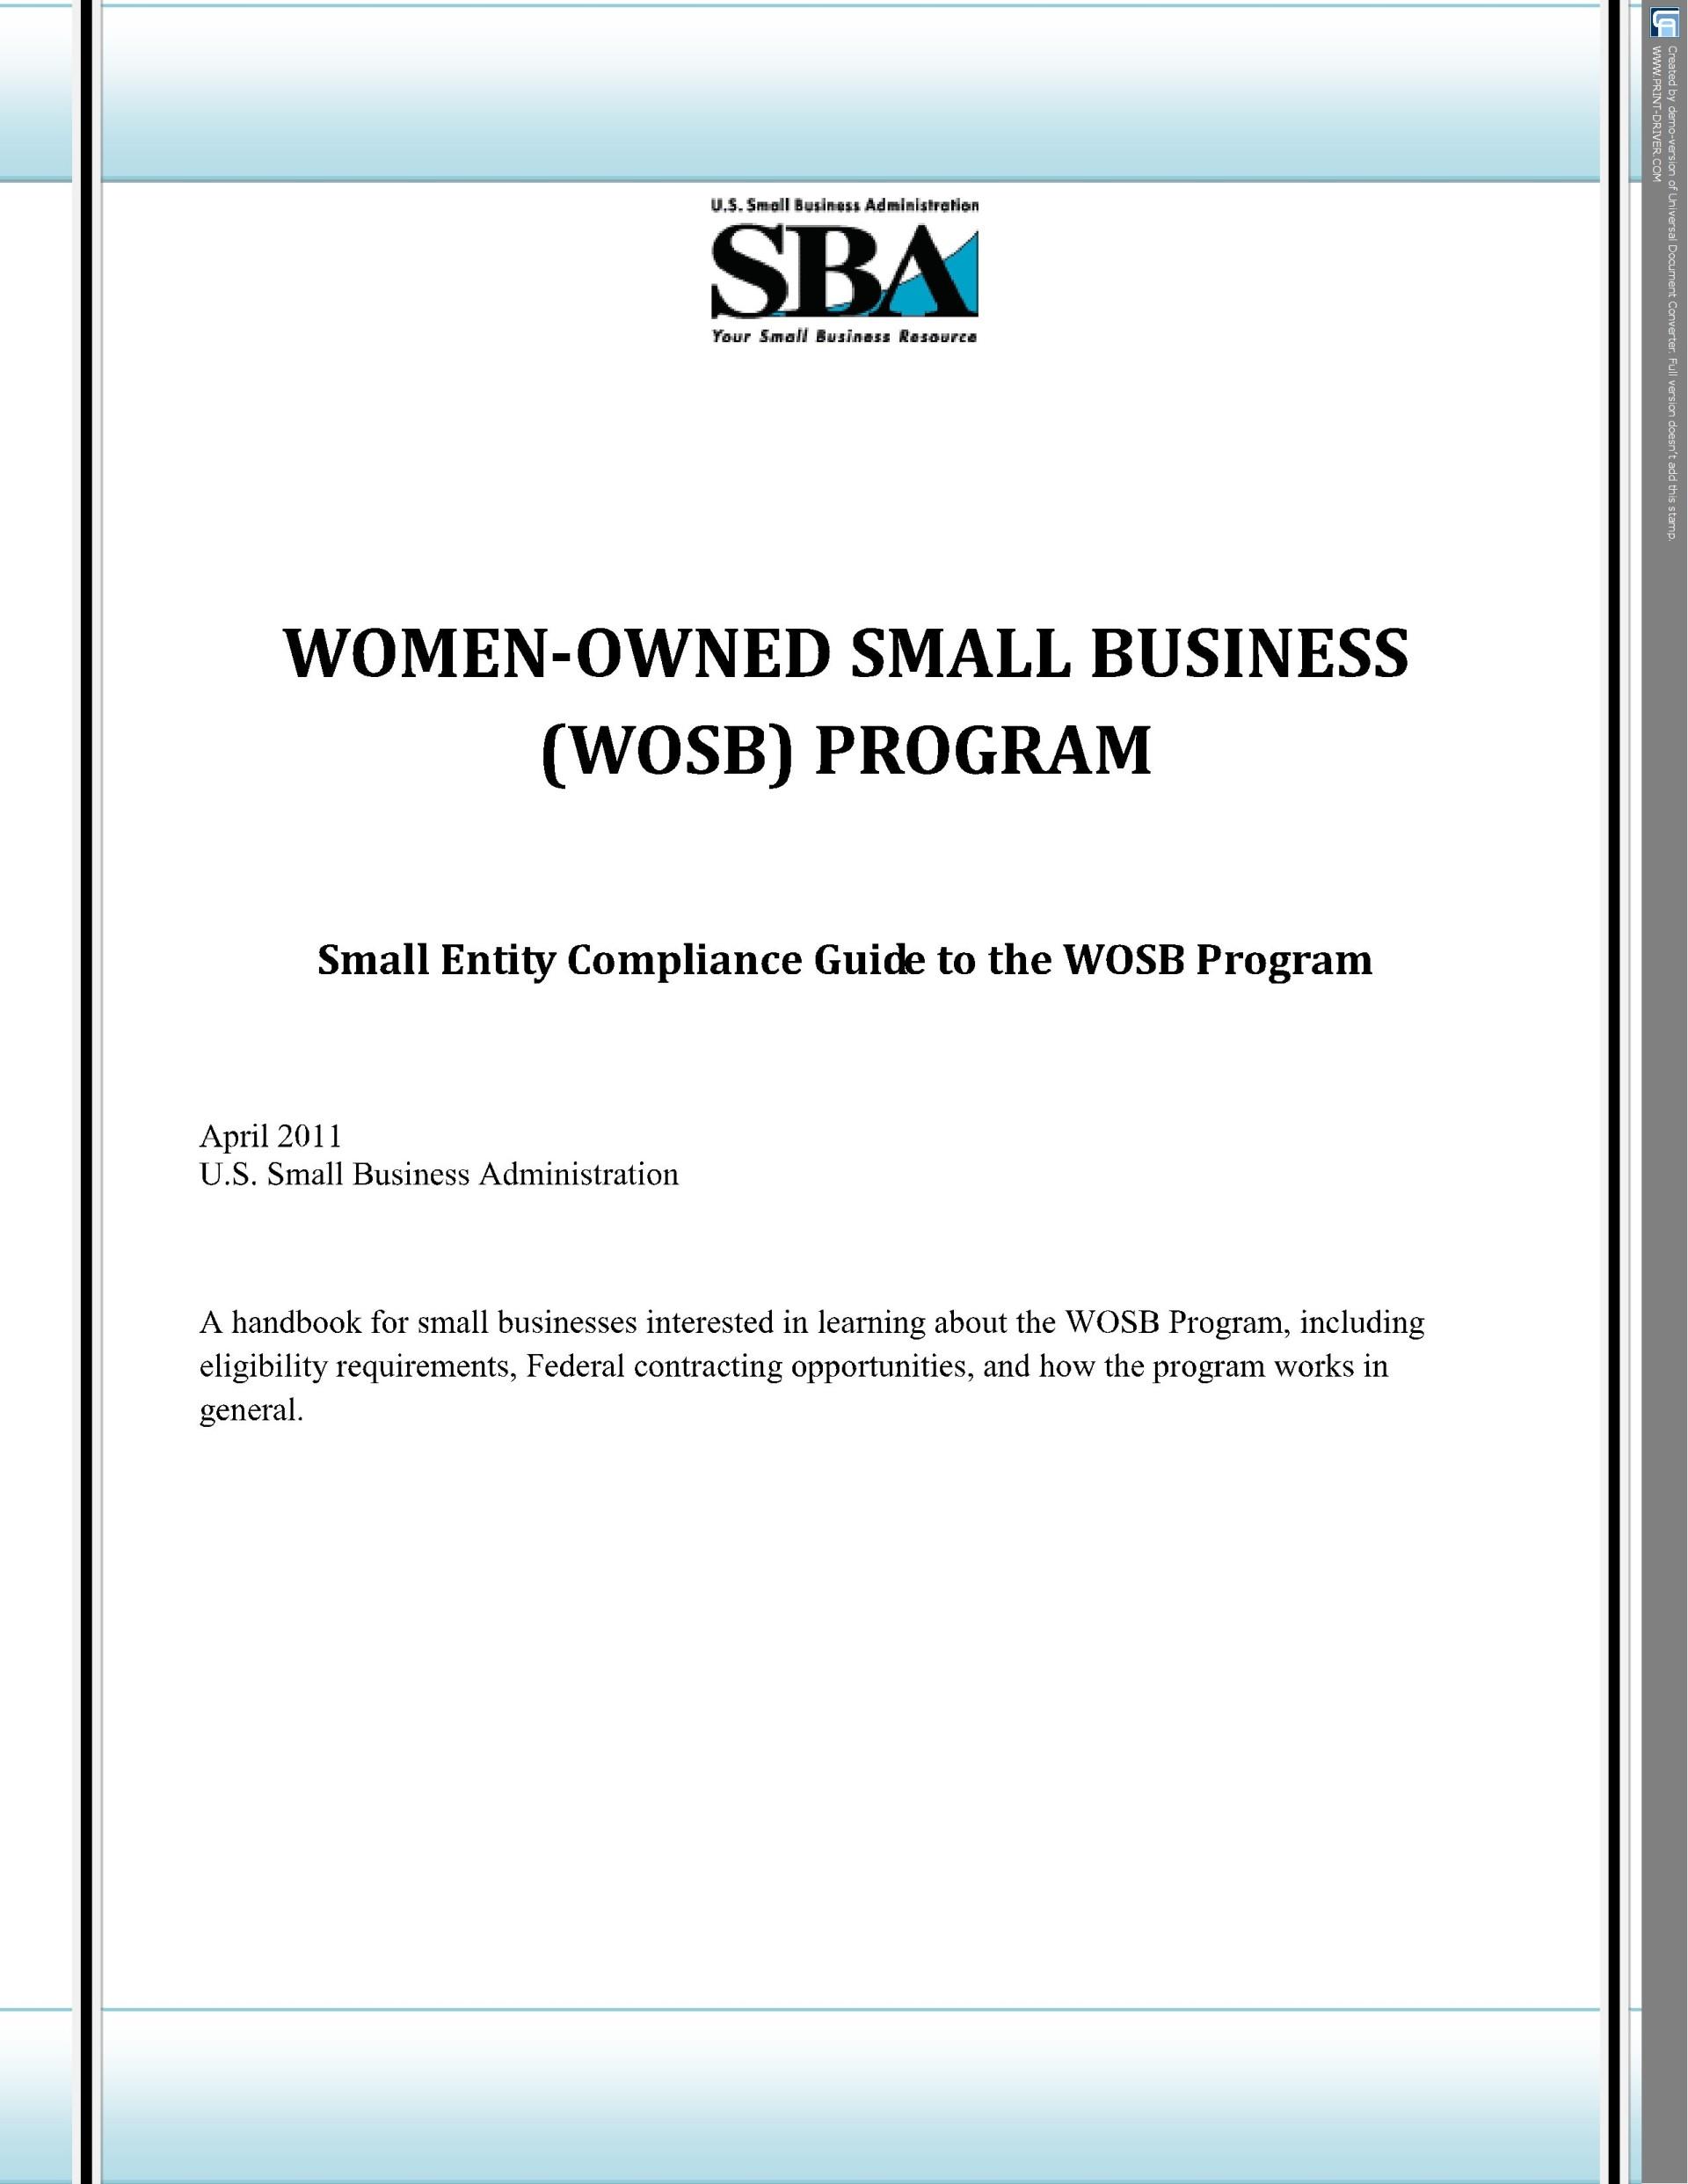 WOMEN-OWNED-SMALL-BUSINESS-(WOSB)-PROGRAM-w1920.jpg